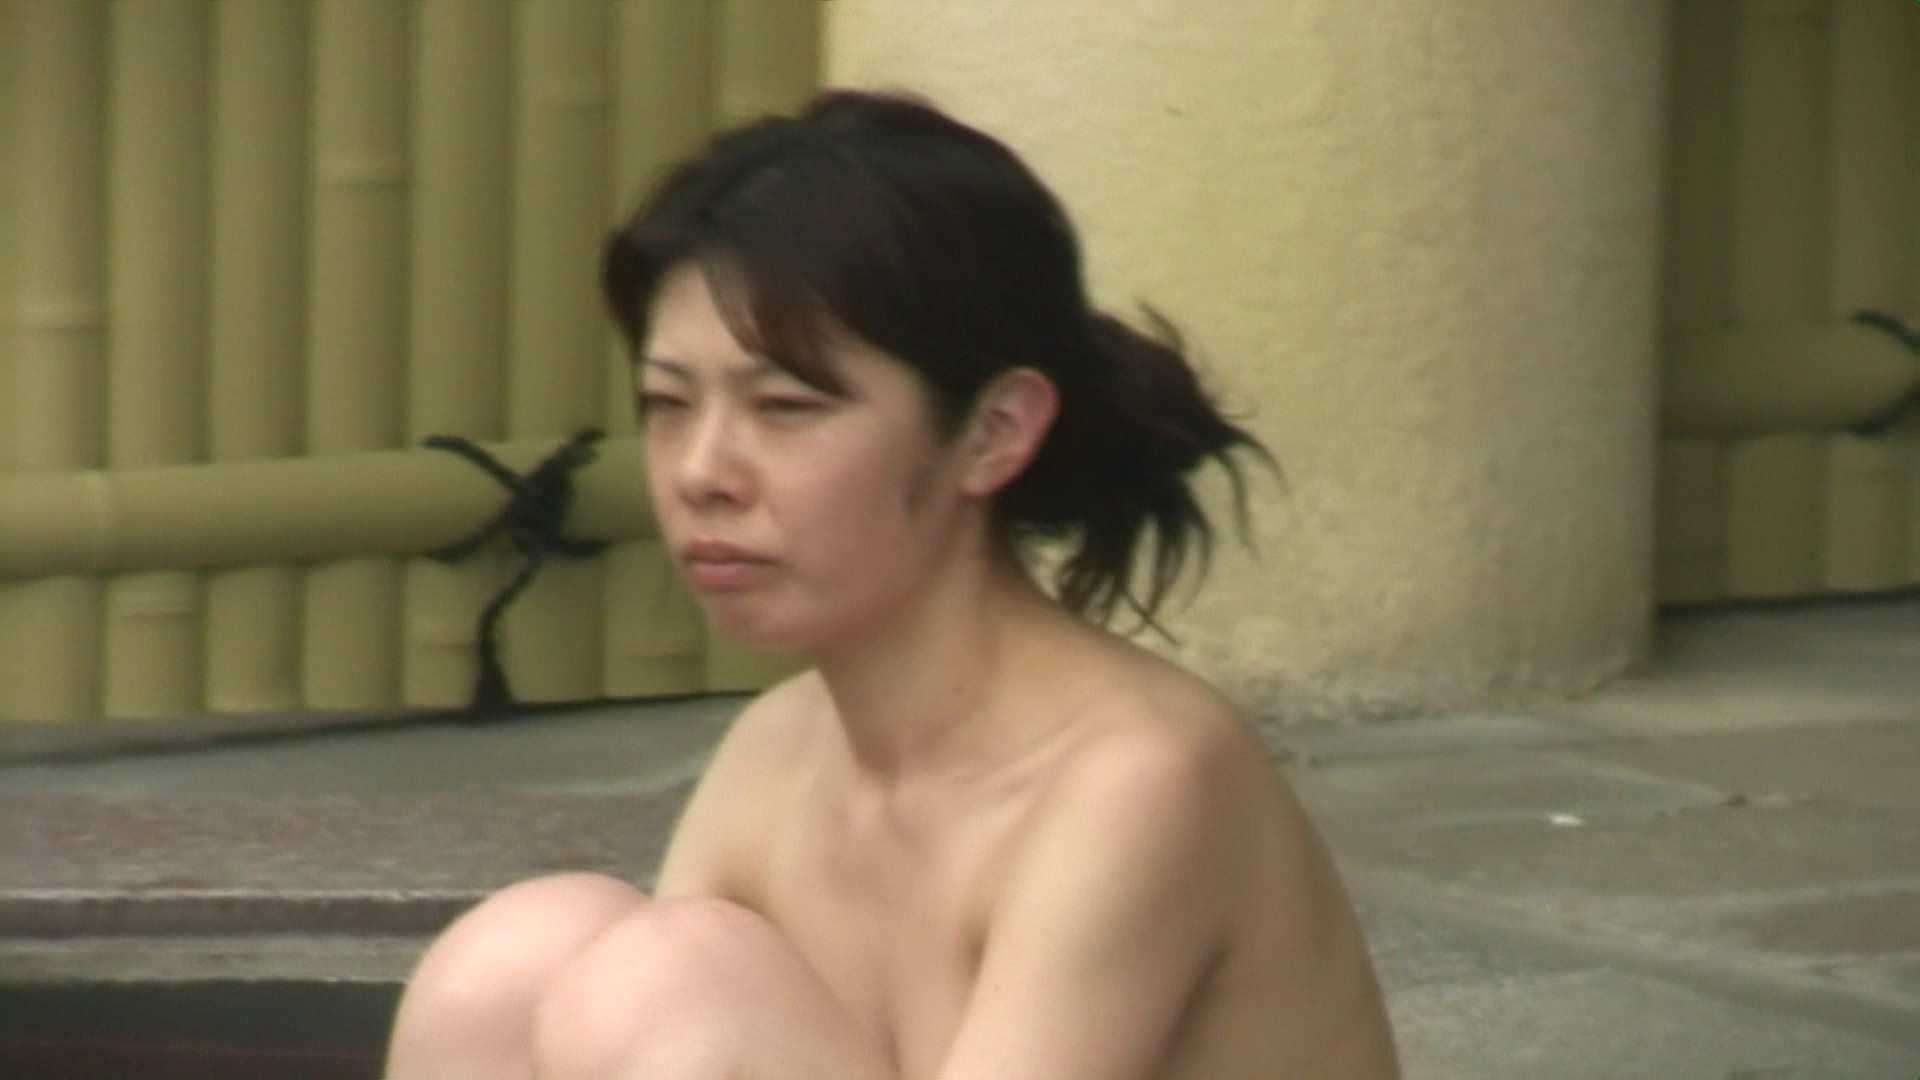 Aquaな露天風呂Vol.676 盗撮シリーズ | 露天風呂編  83PIX 69